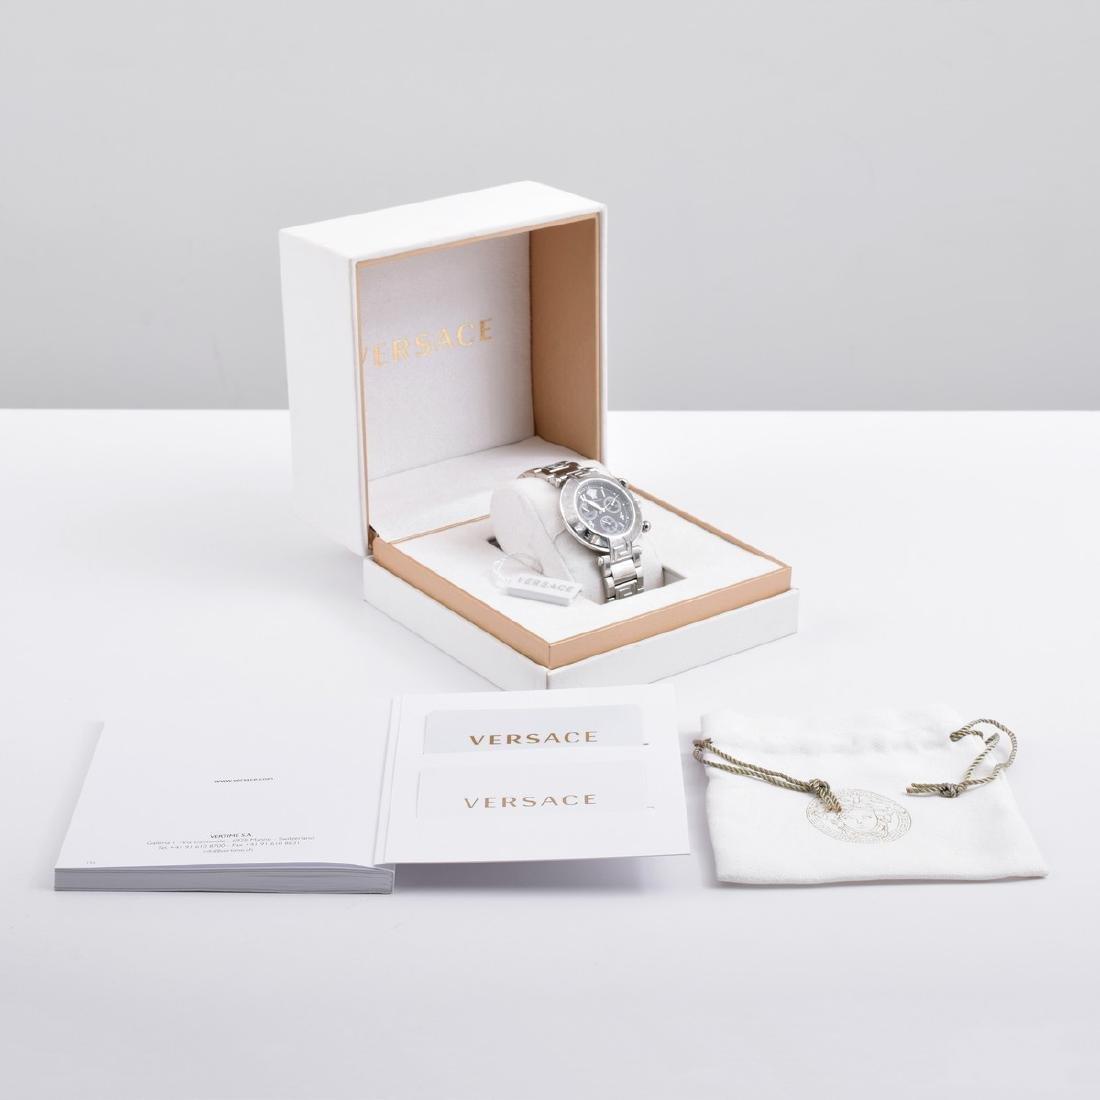 Versace REVIVE Chronograph Watch - 4